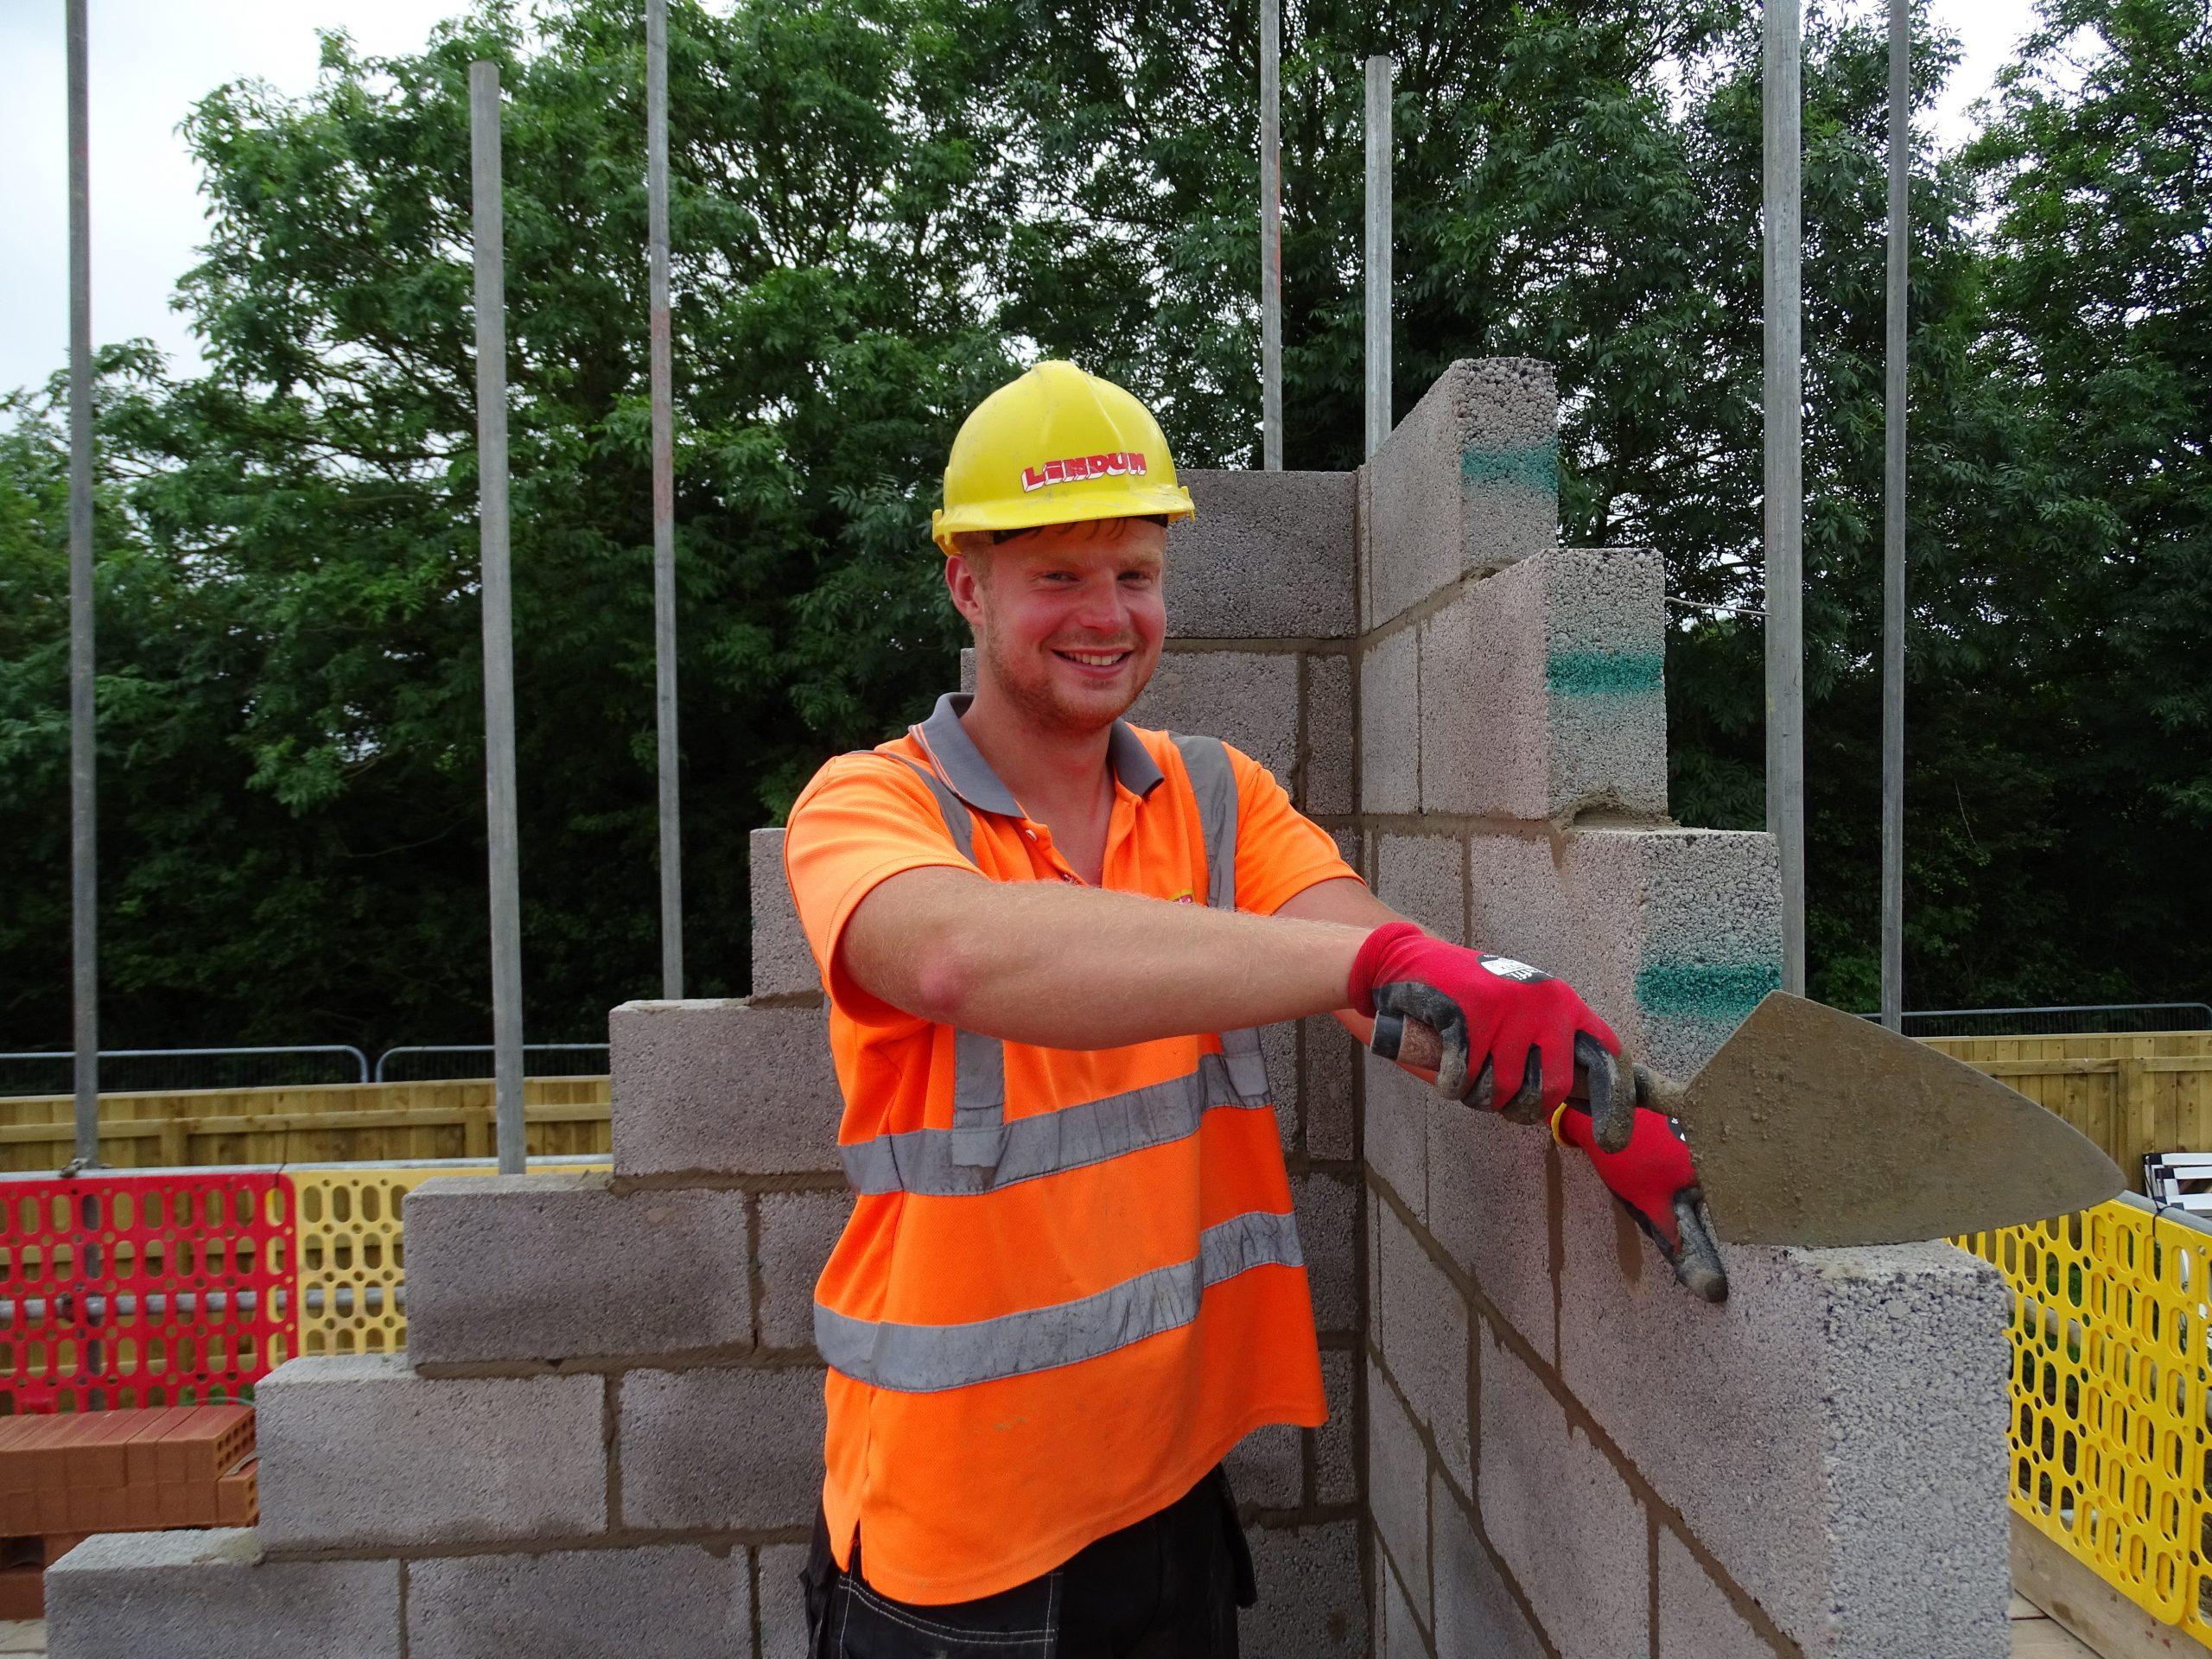 Our bricklayer's Scott talent!